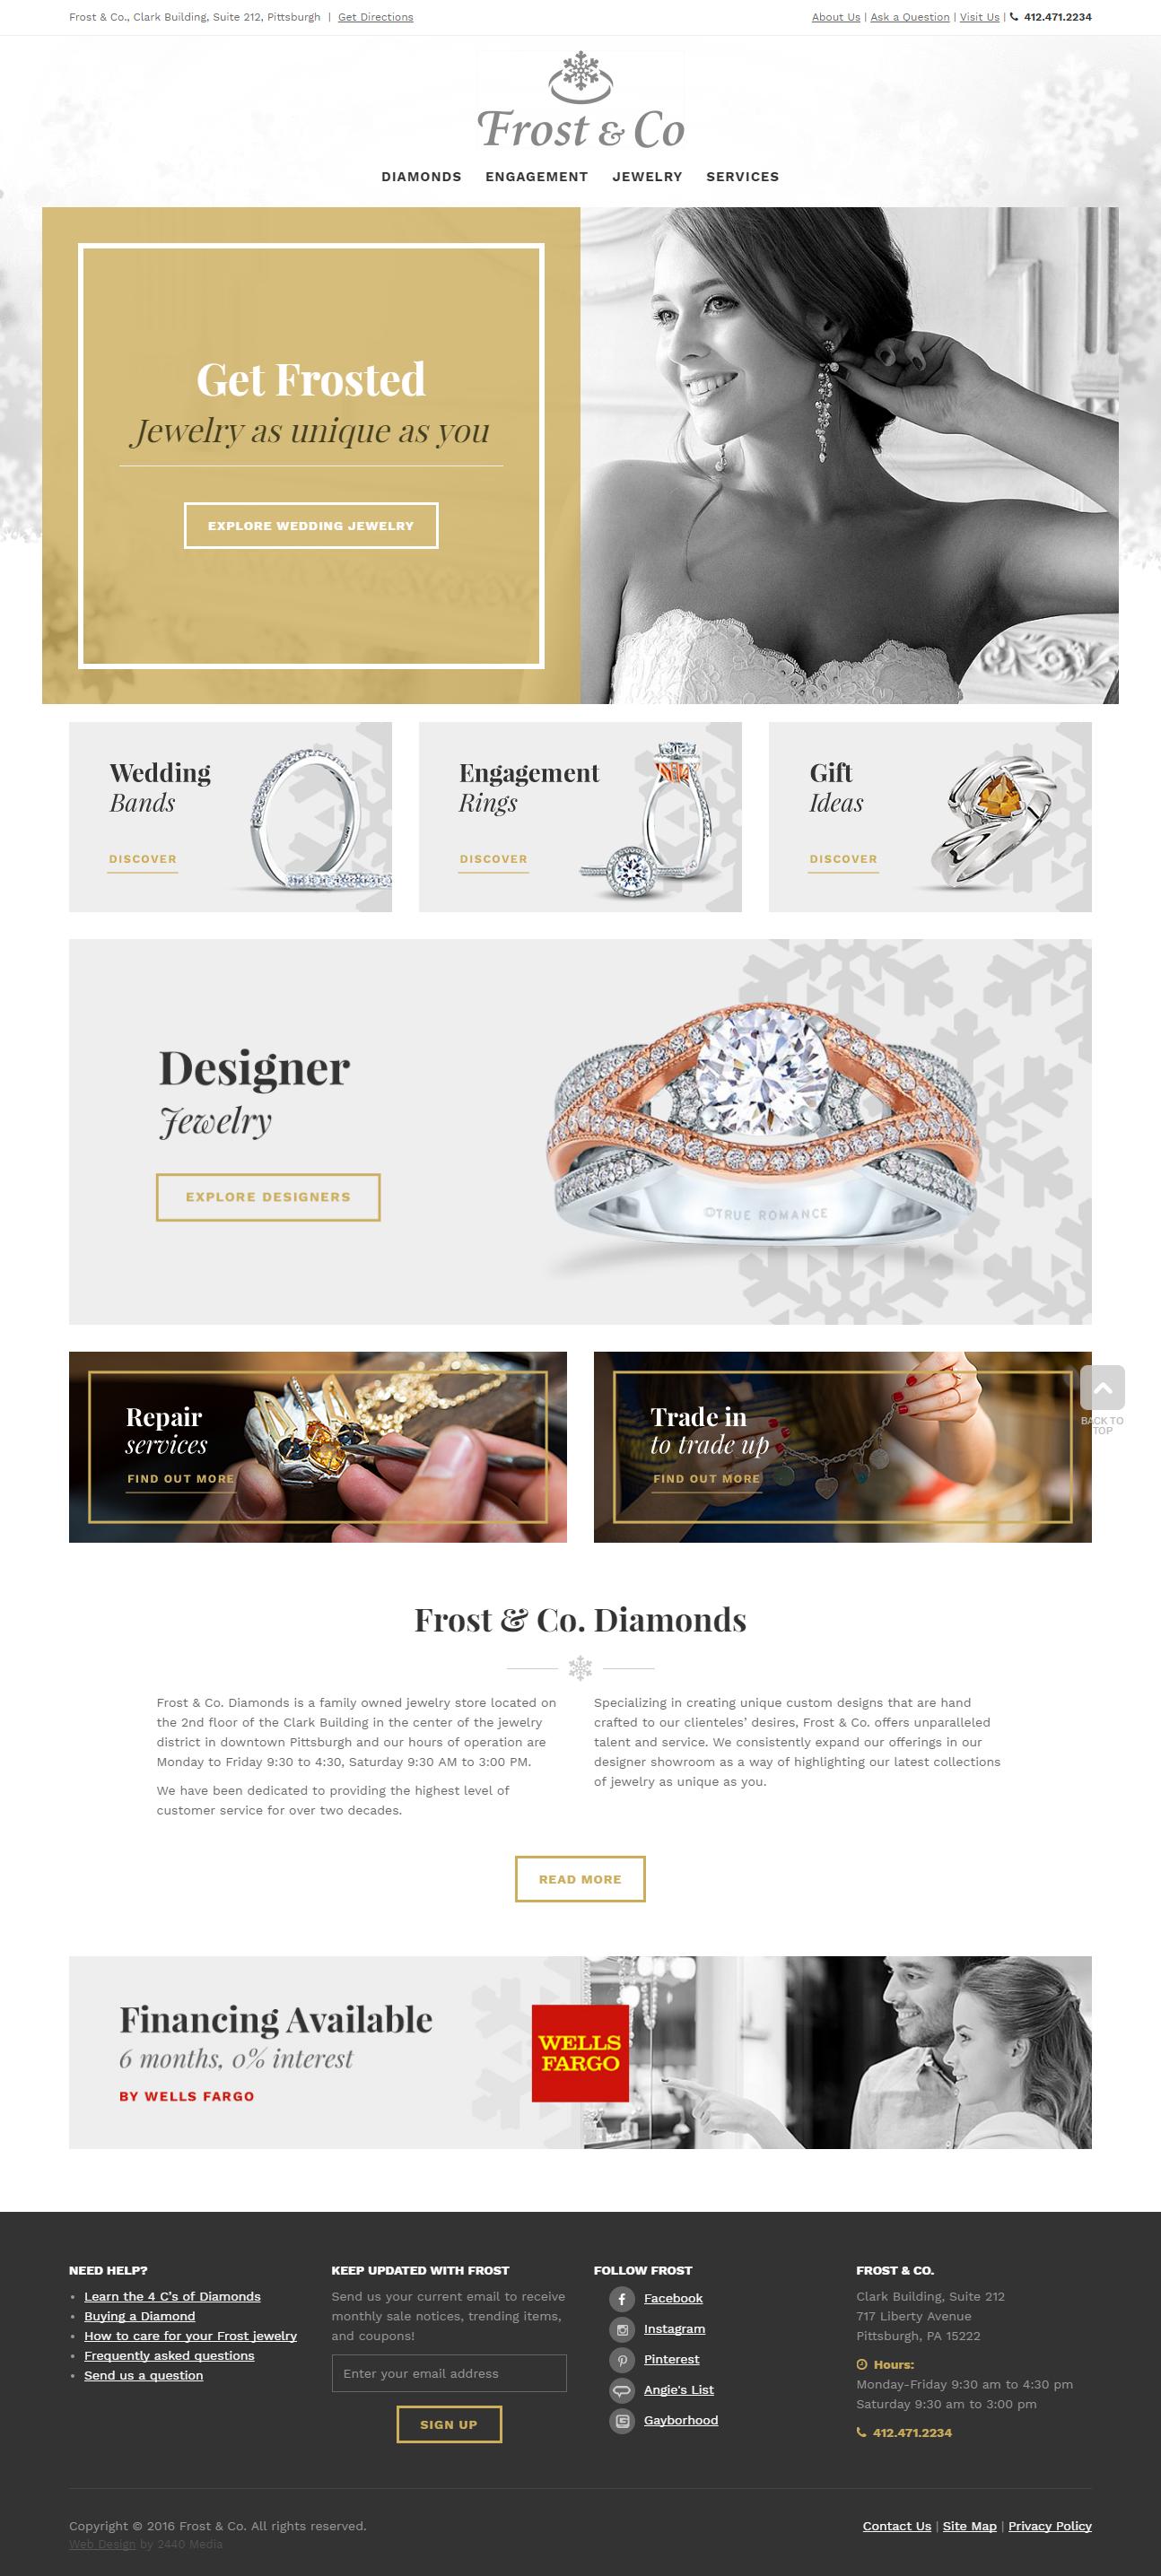 Frost Diamonds Custom Website Design Http Www Frostdiamonds Com Jewelry Website Design Portfolio Web Design Custom Website Design